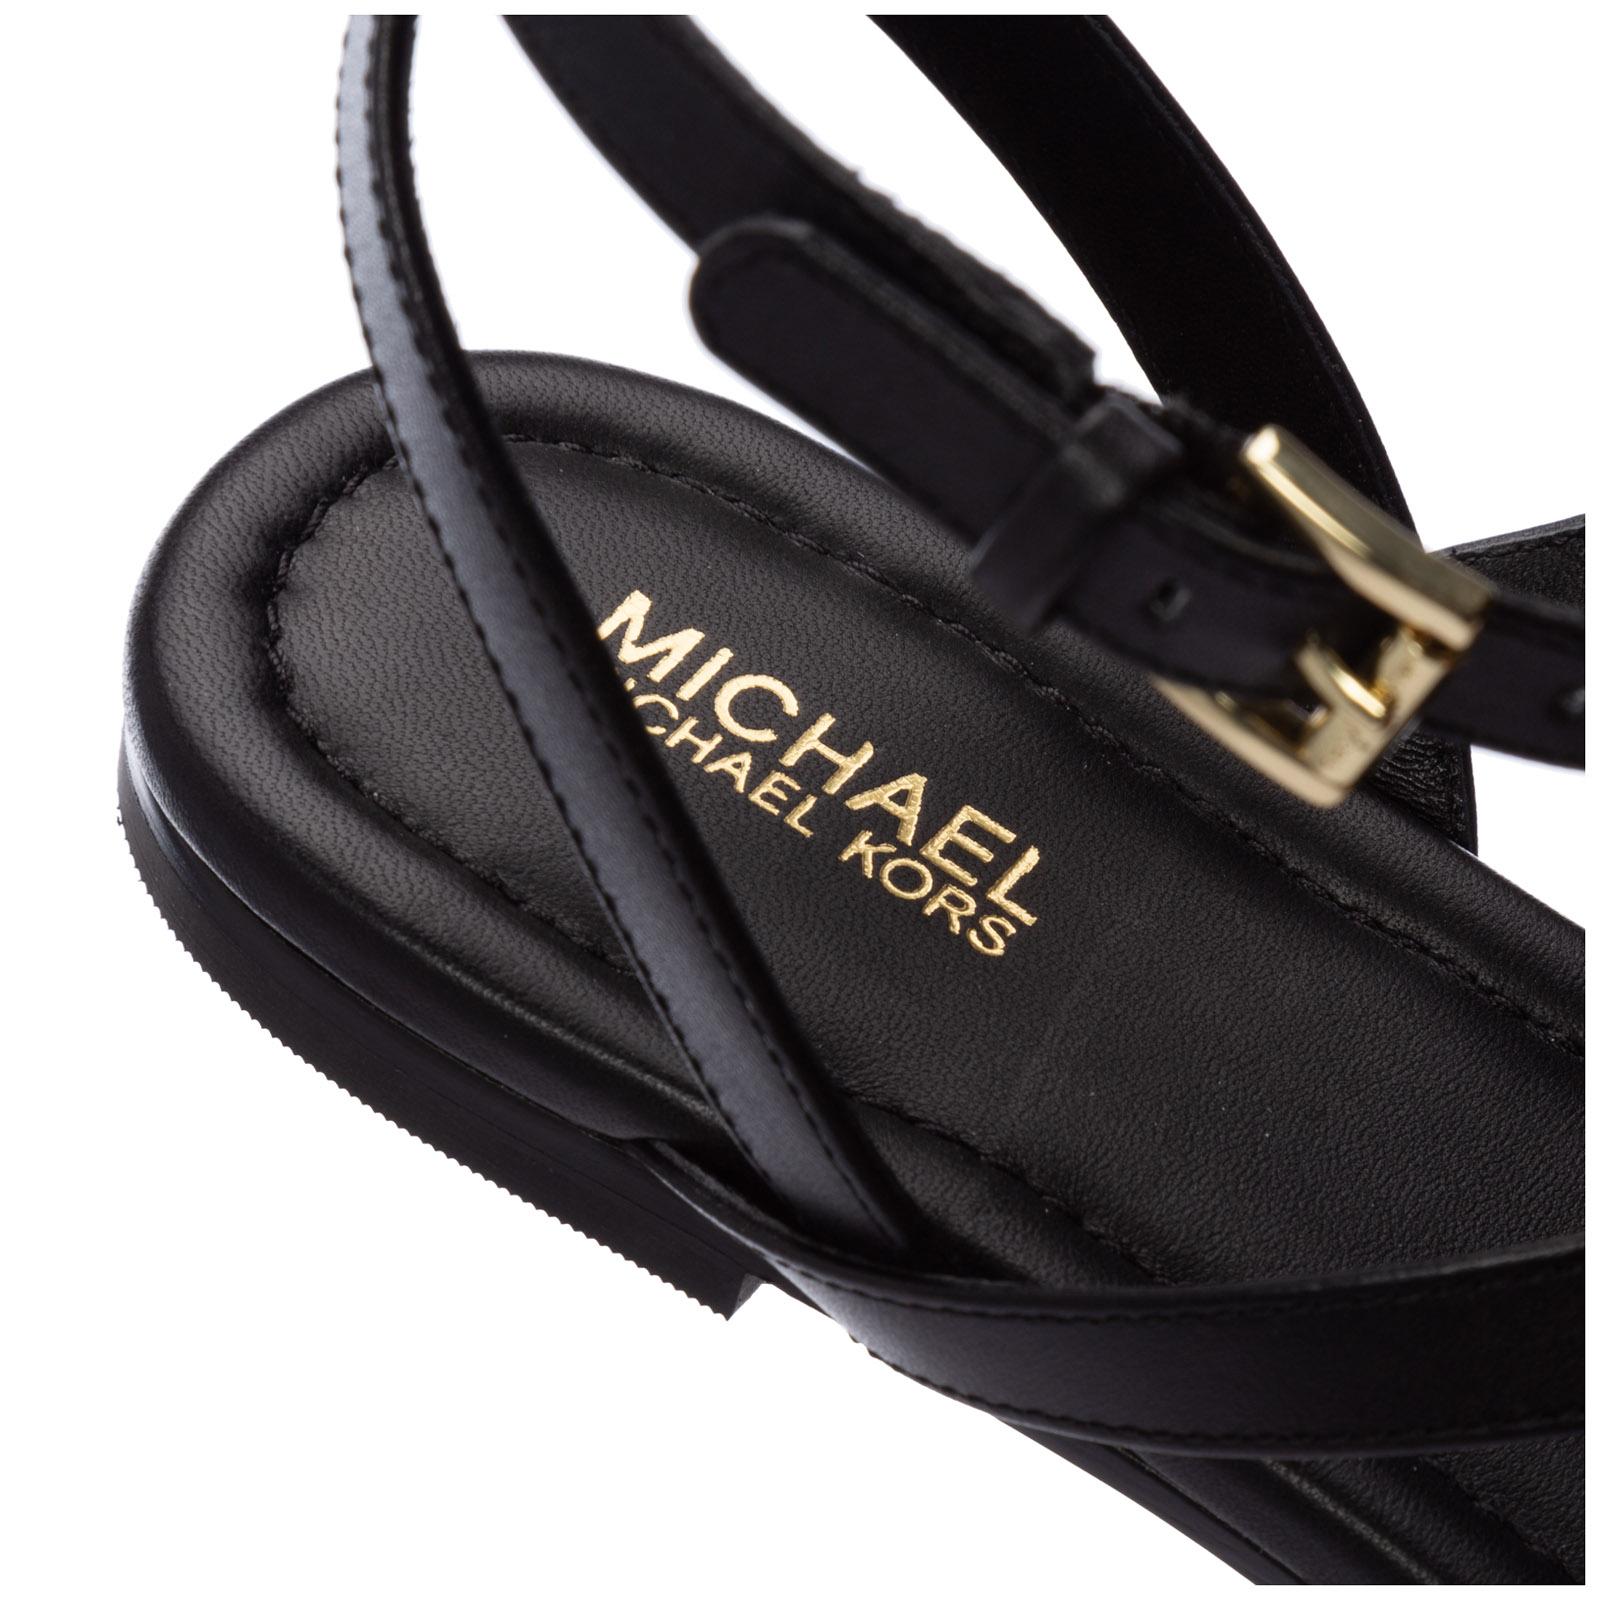 Women's leather sandals  tasha